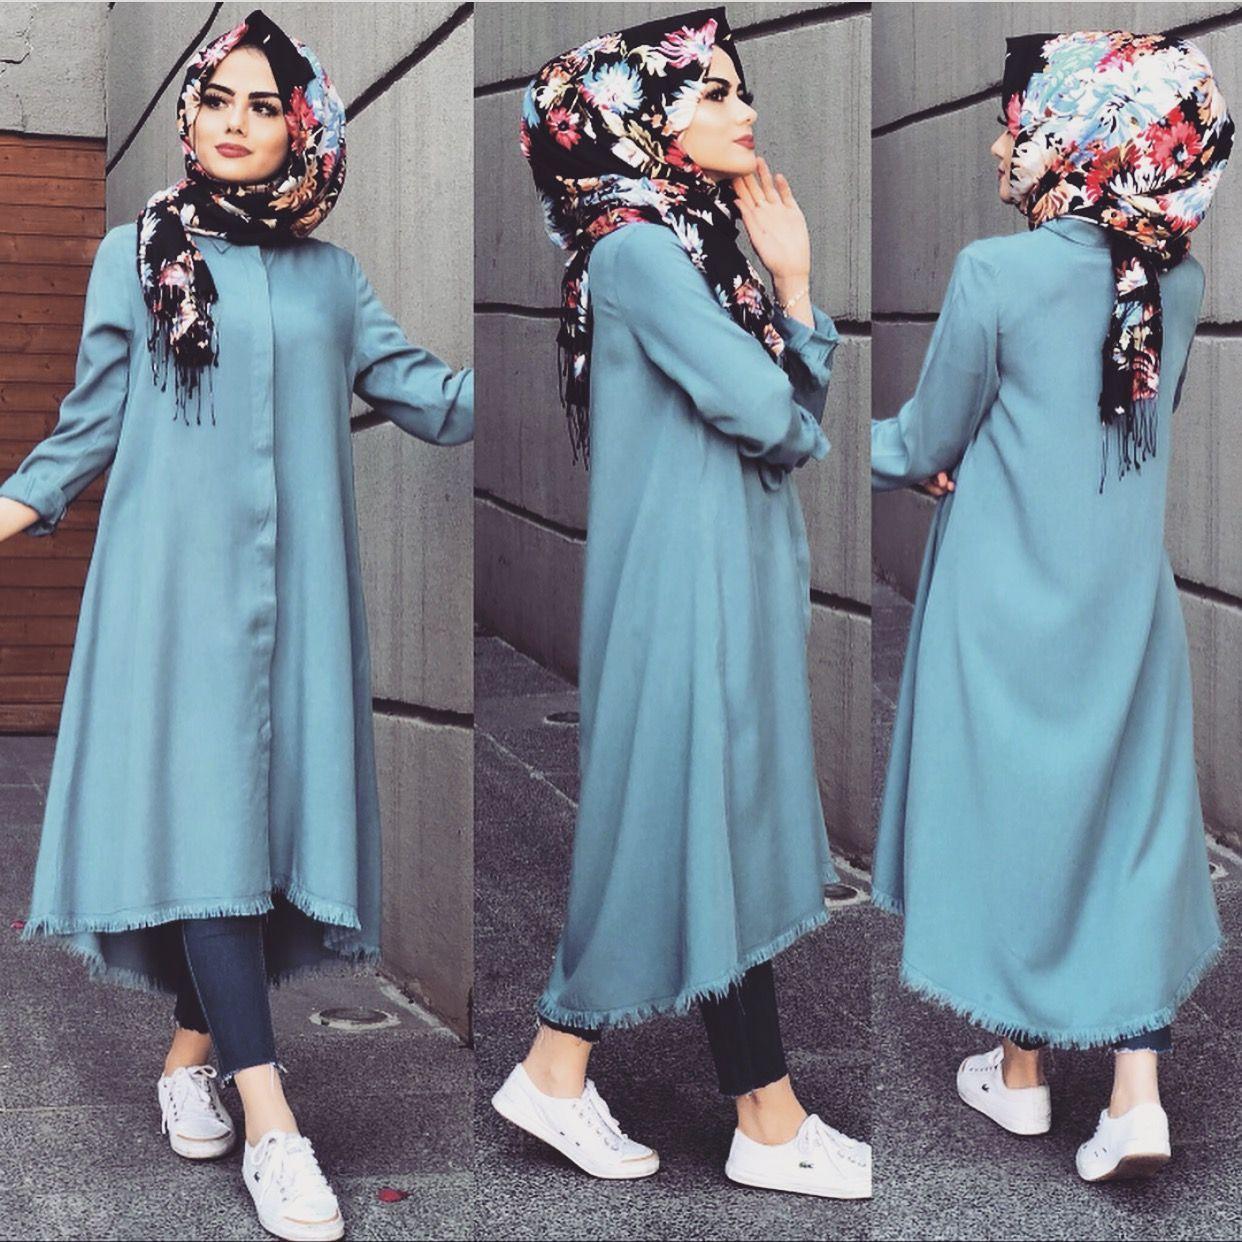 Hijab #hijab #hijabfashion #hijabers #gamis #jilbab #hijabstyle